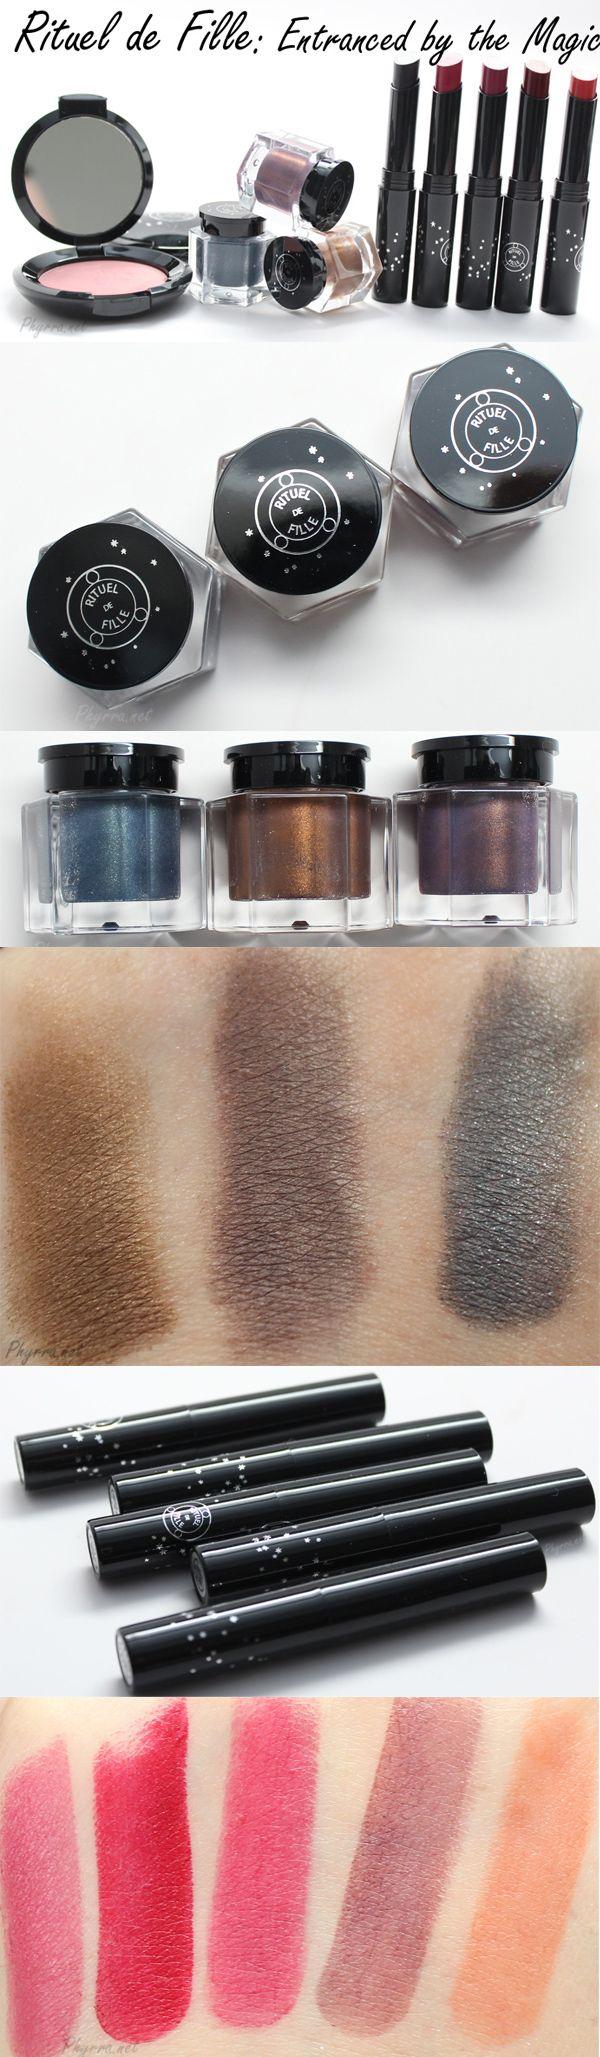 Rituel de Fille artisan makeup